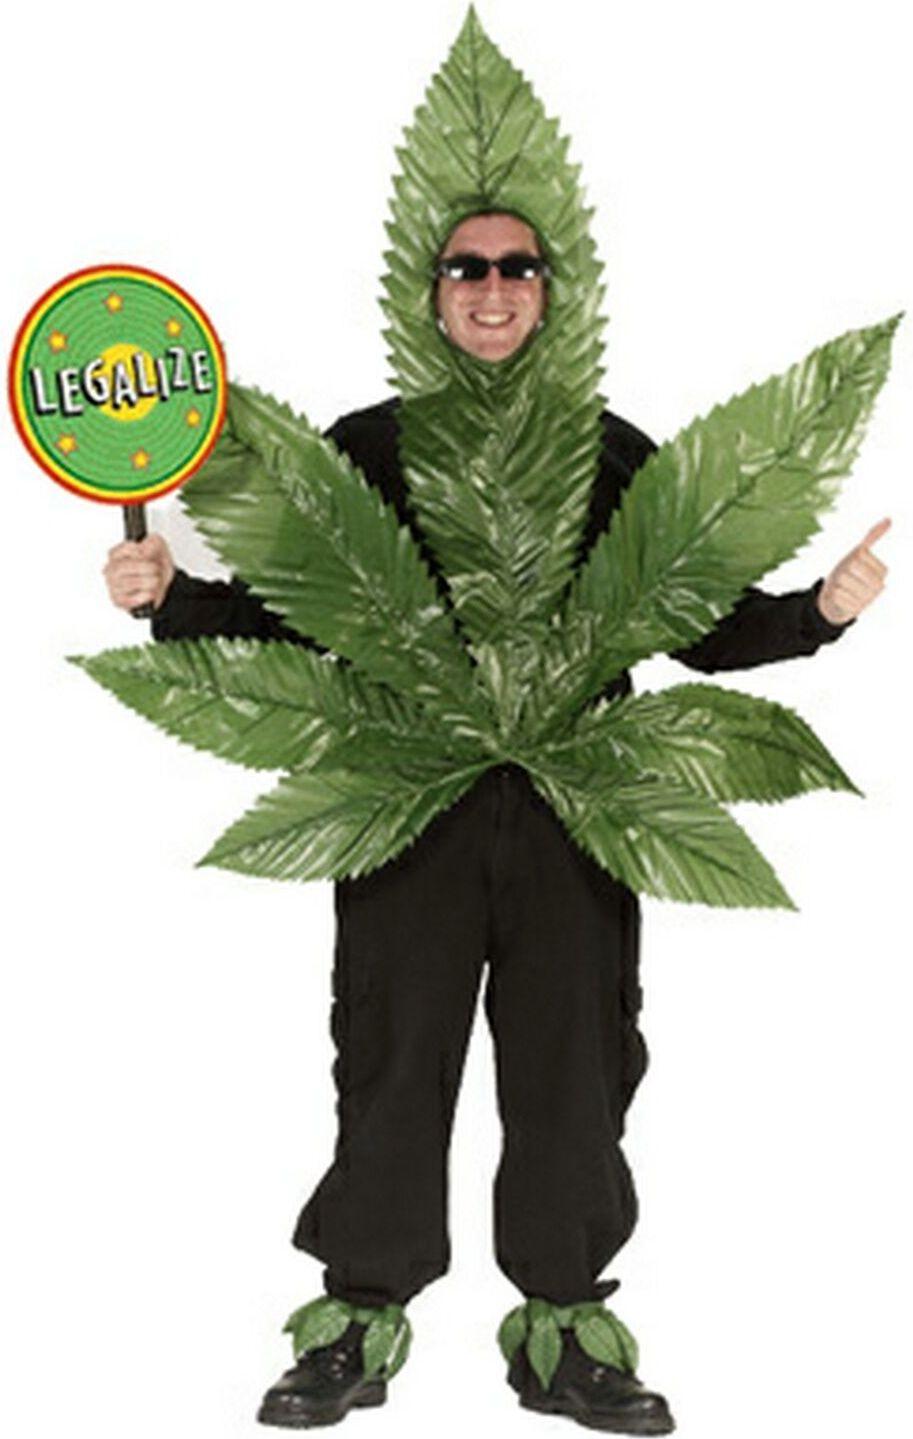 Ganja Man Costume #ganjacostume | Funny Costumes for Men ...